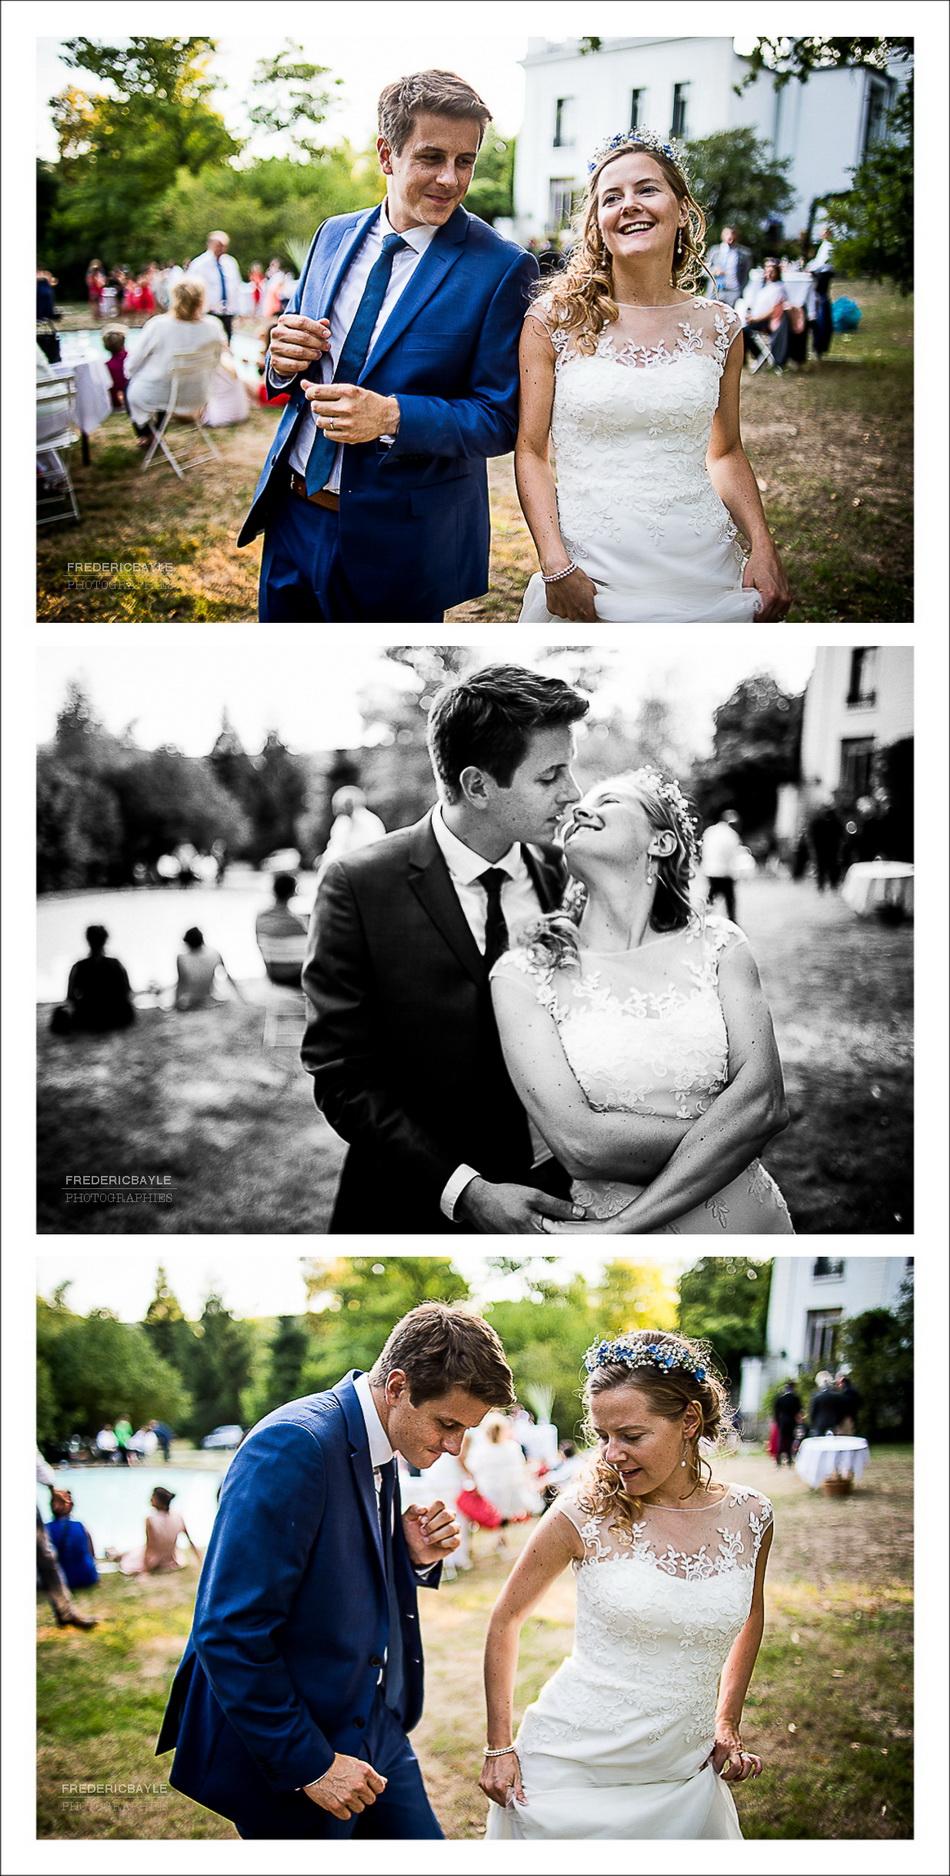 reportage-mariage-maison-brunel-53